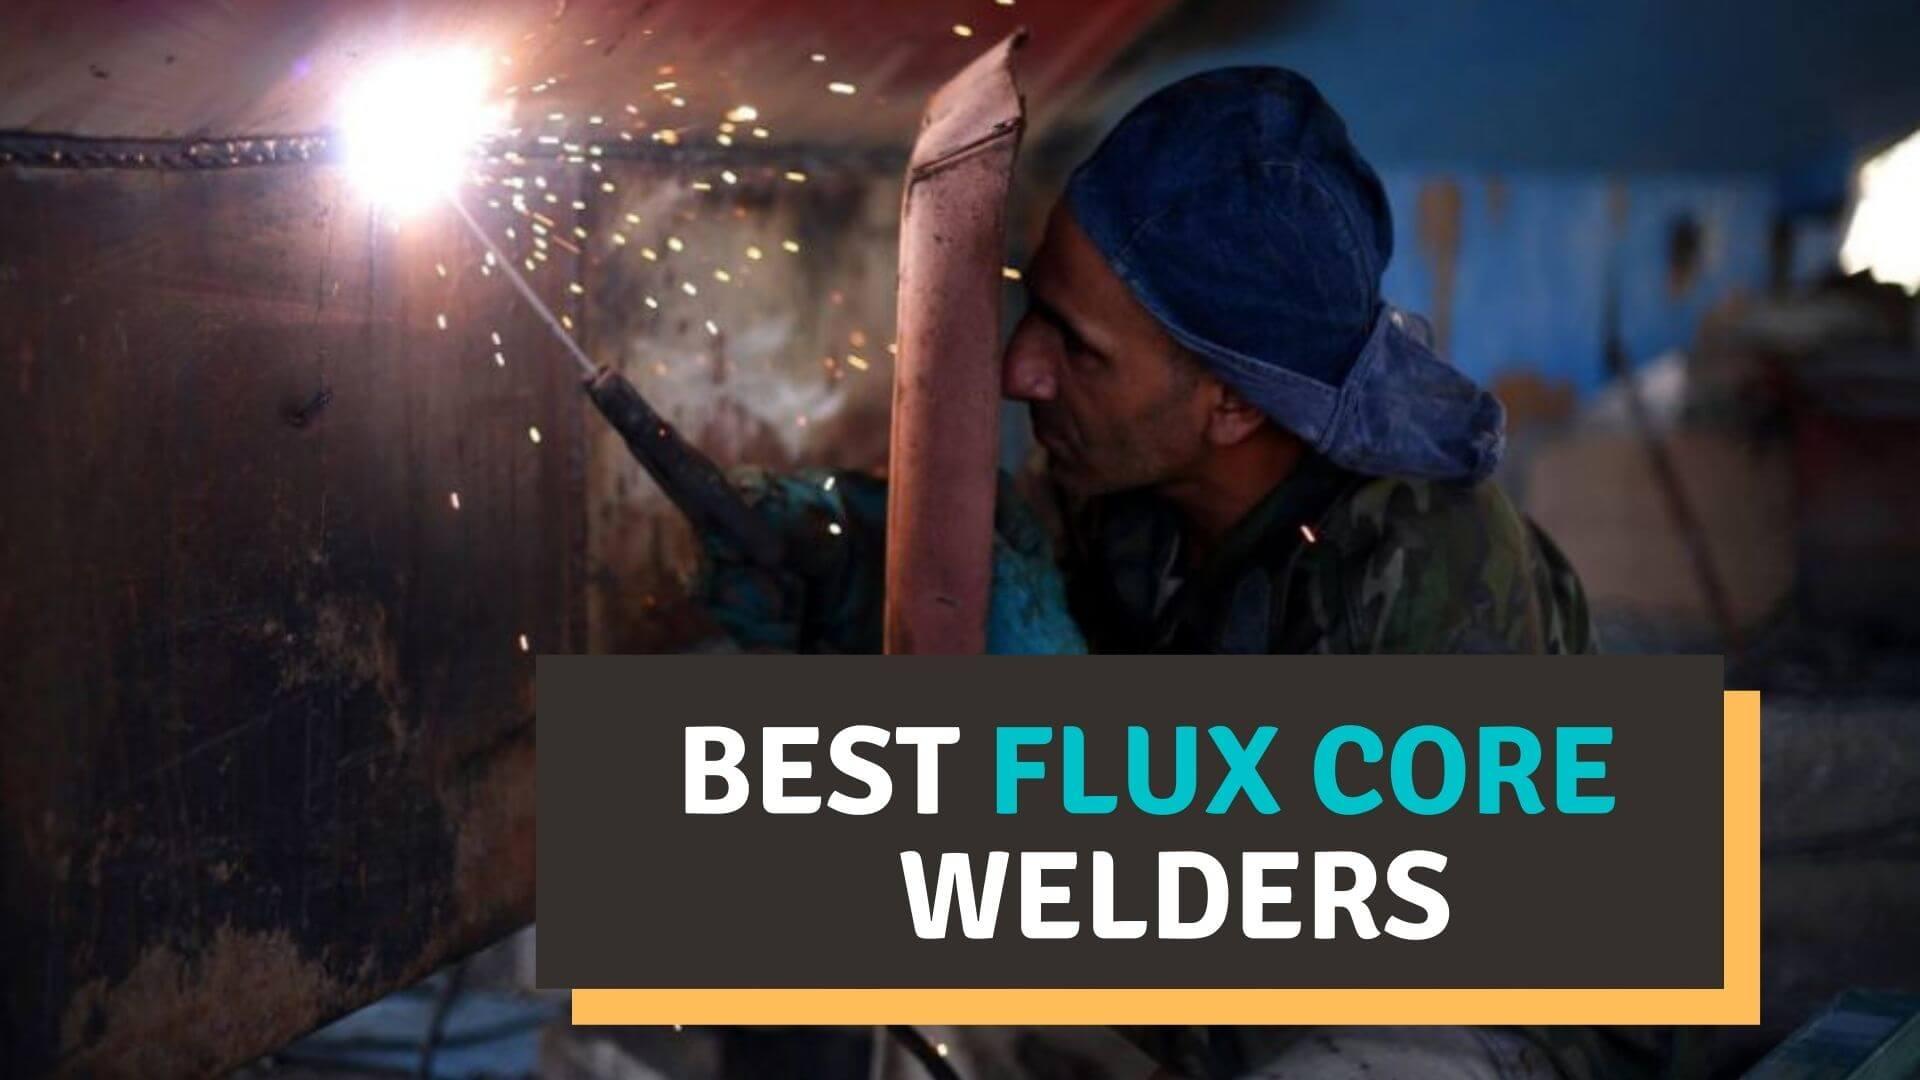 Best flux core WELDERS